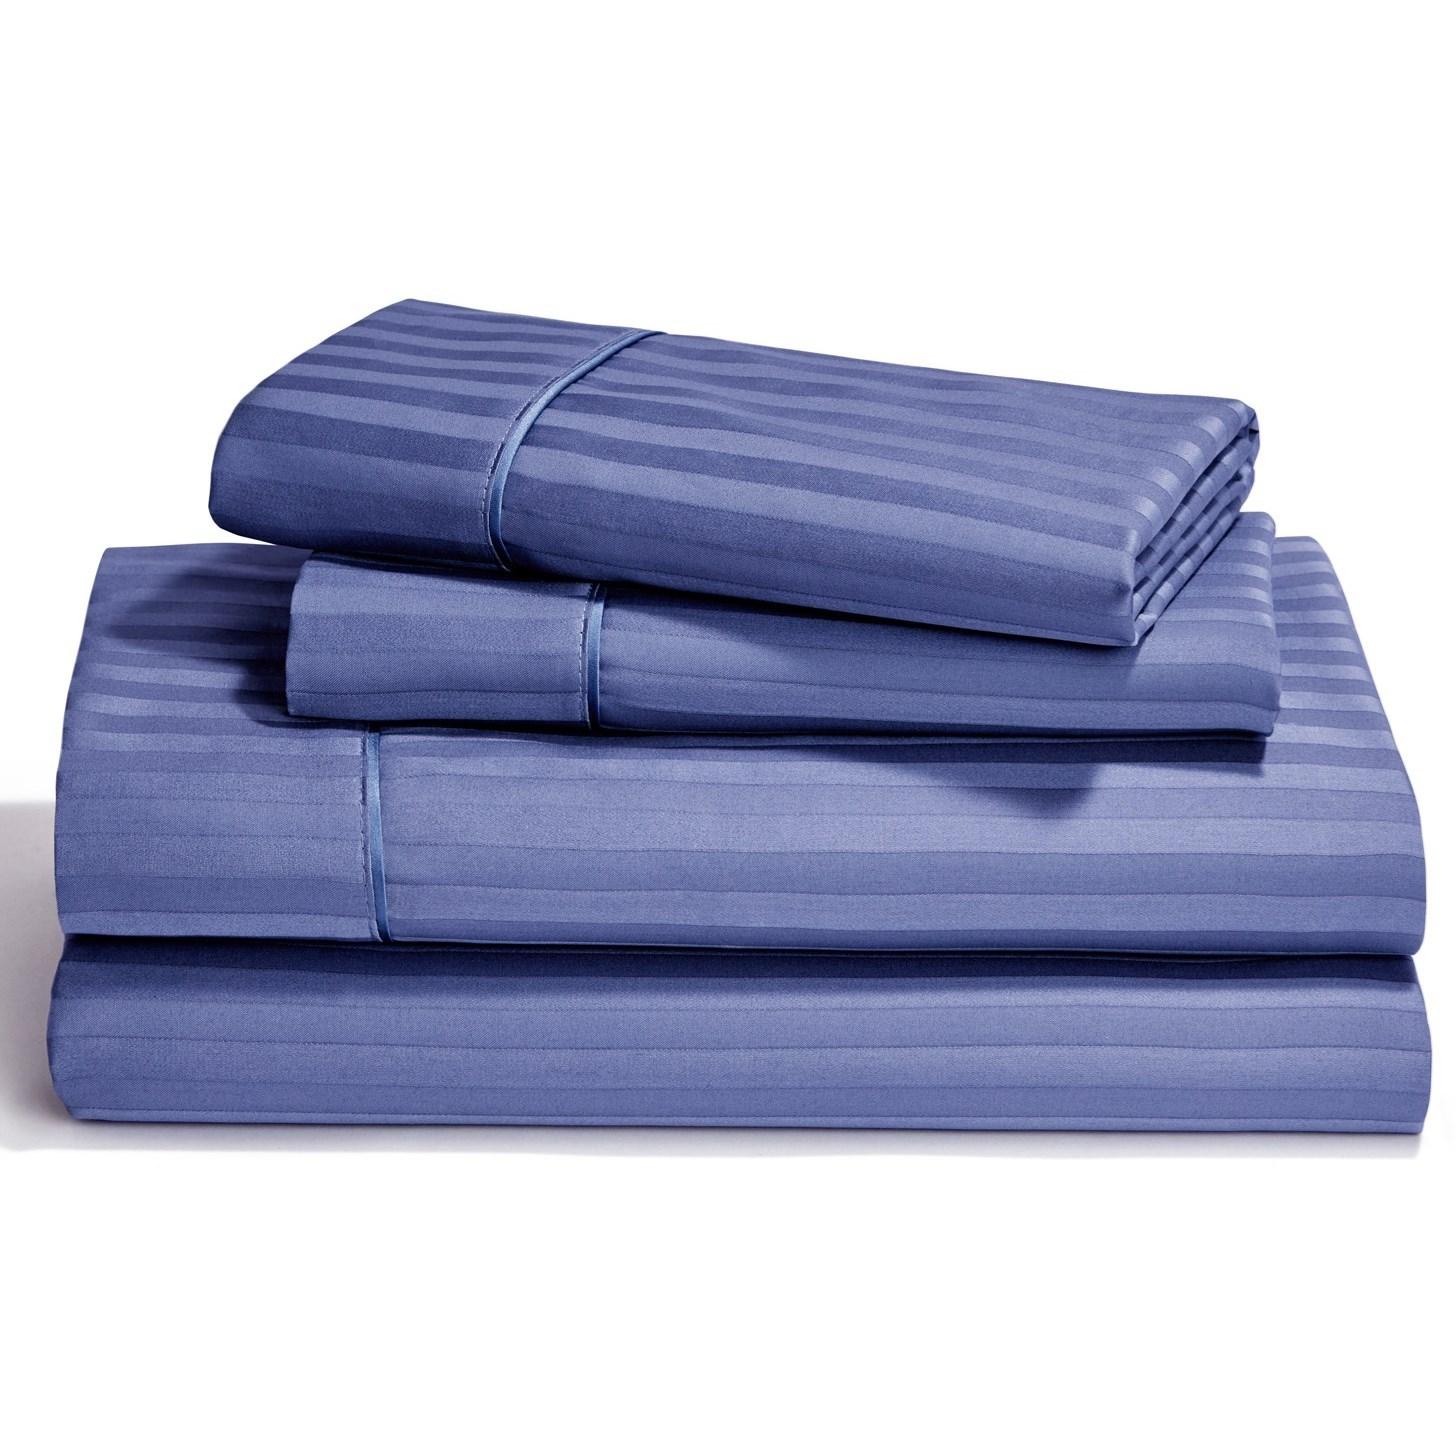 Egyptian Cotton Sheet Sets Full Denim Flat Sheet Set at Johnny Janosik